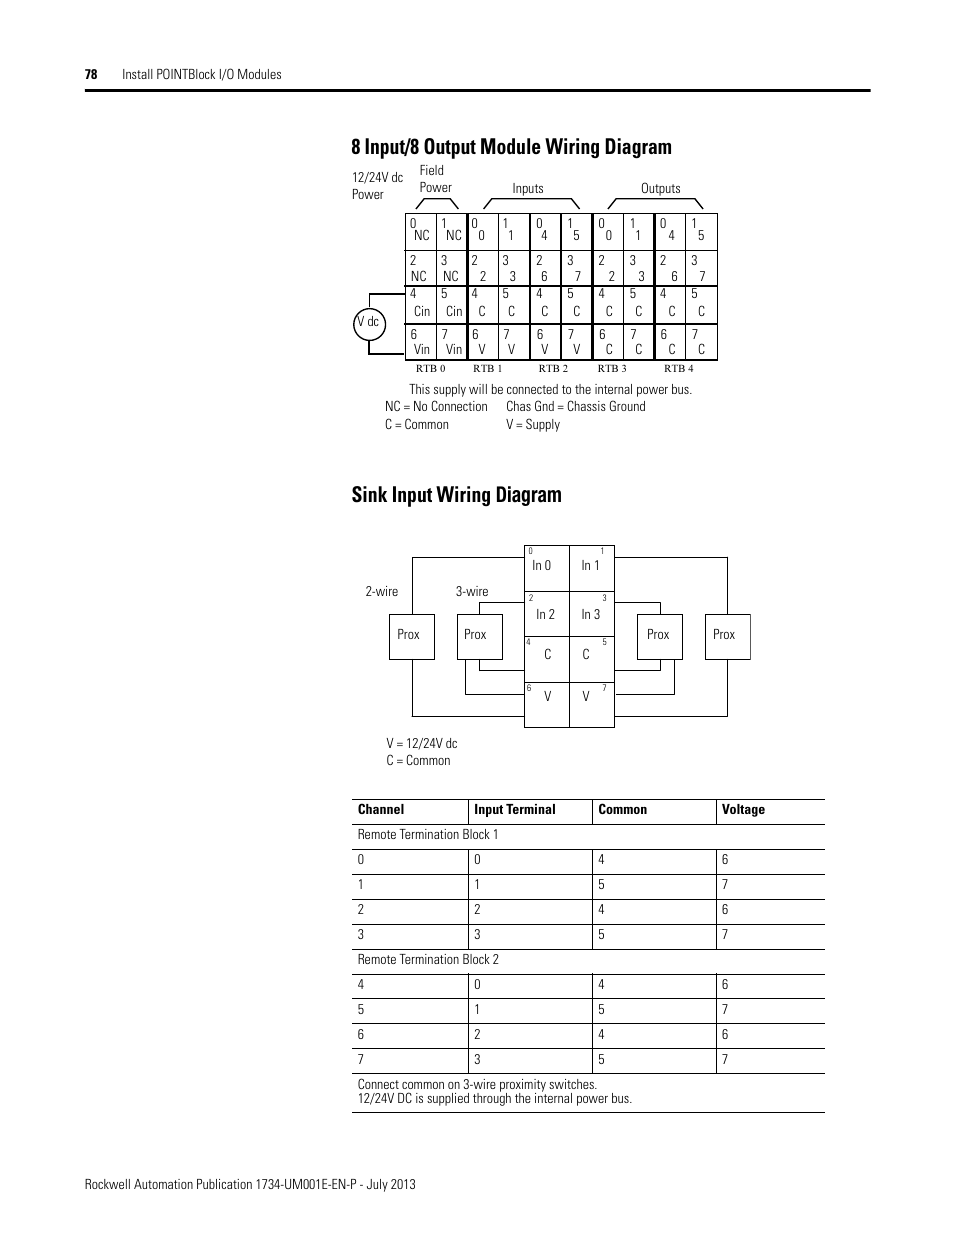 8 input/8 output module wiring diagram, sink input wiring ... rockwell compactool wiring diagram 65 pontiac wiring diagram